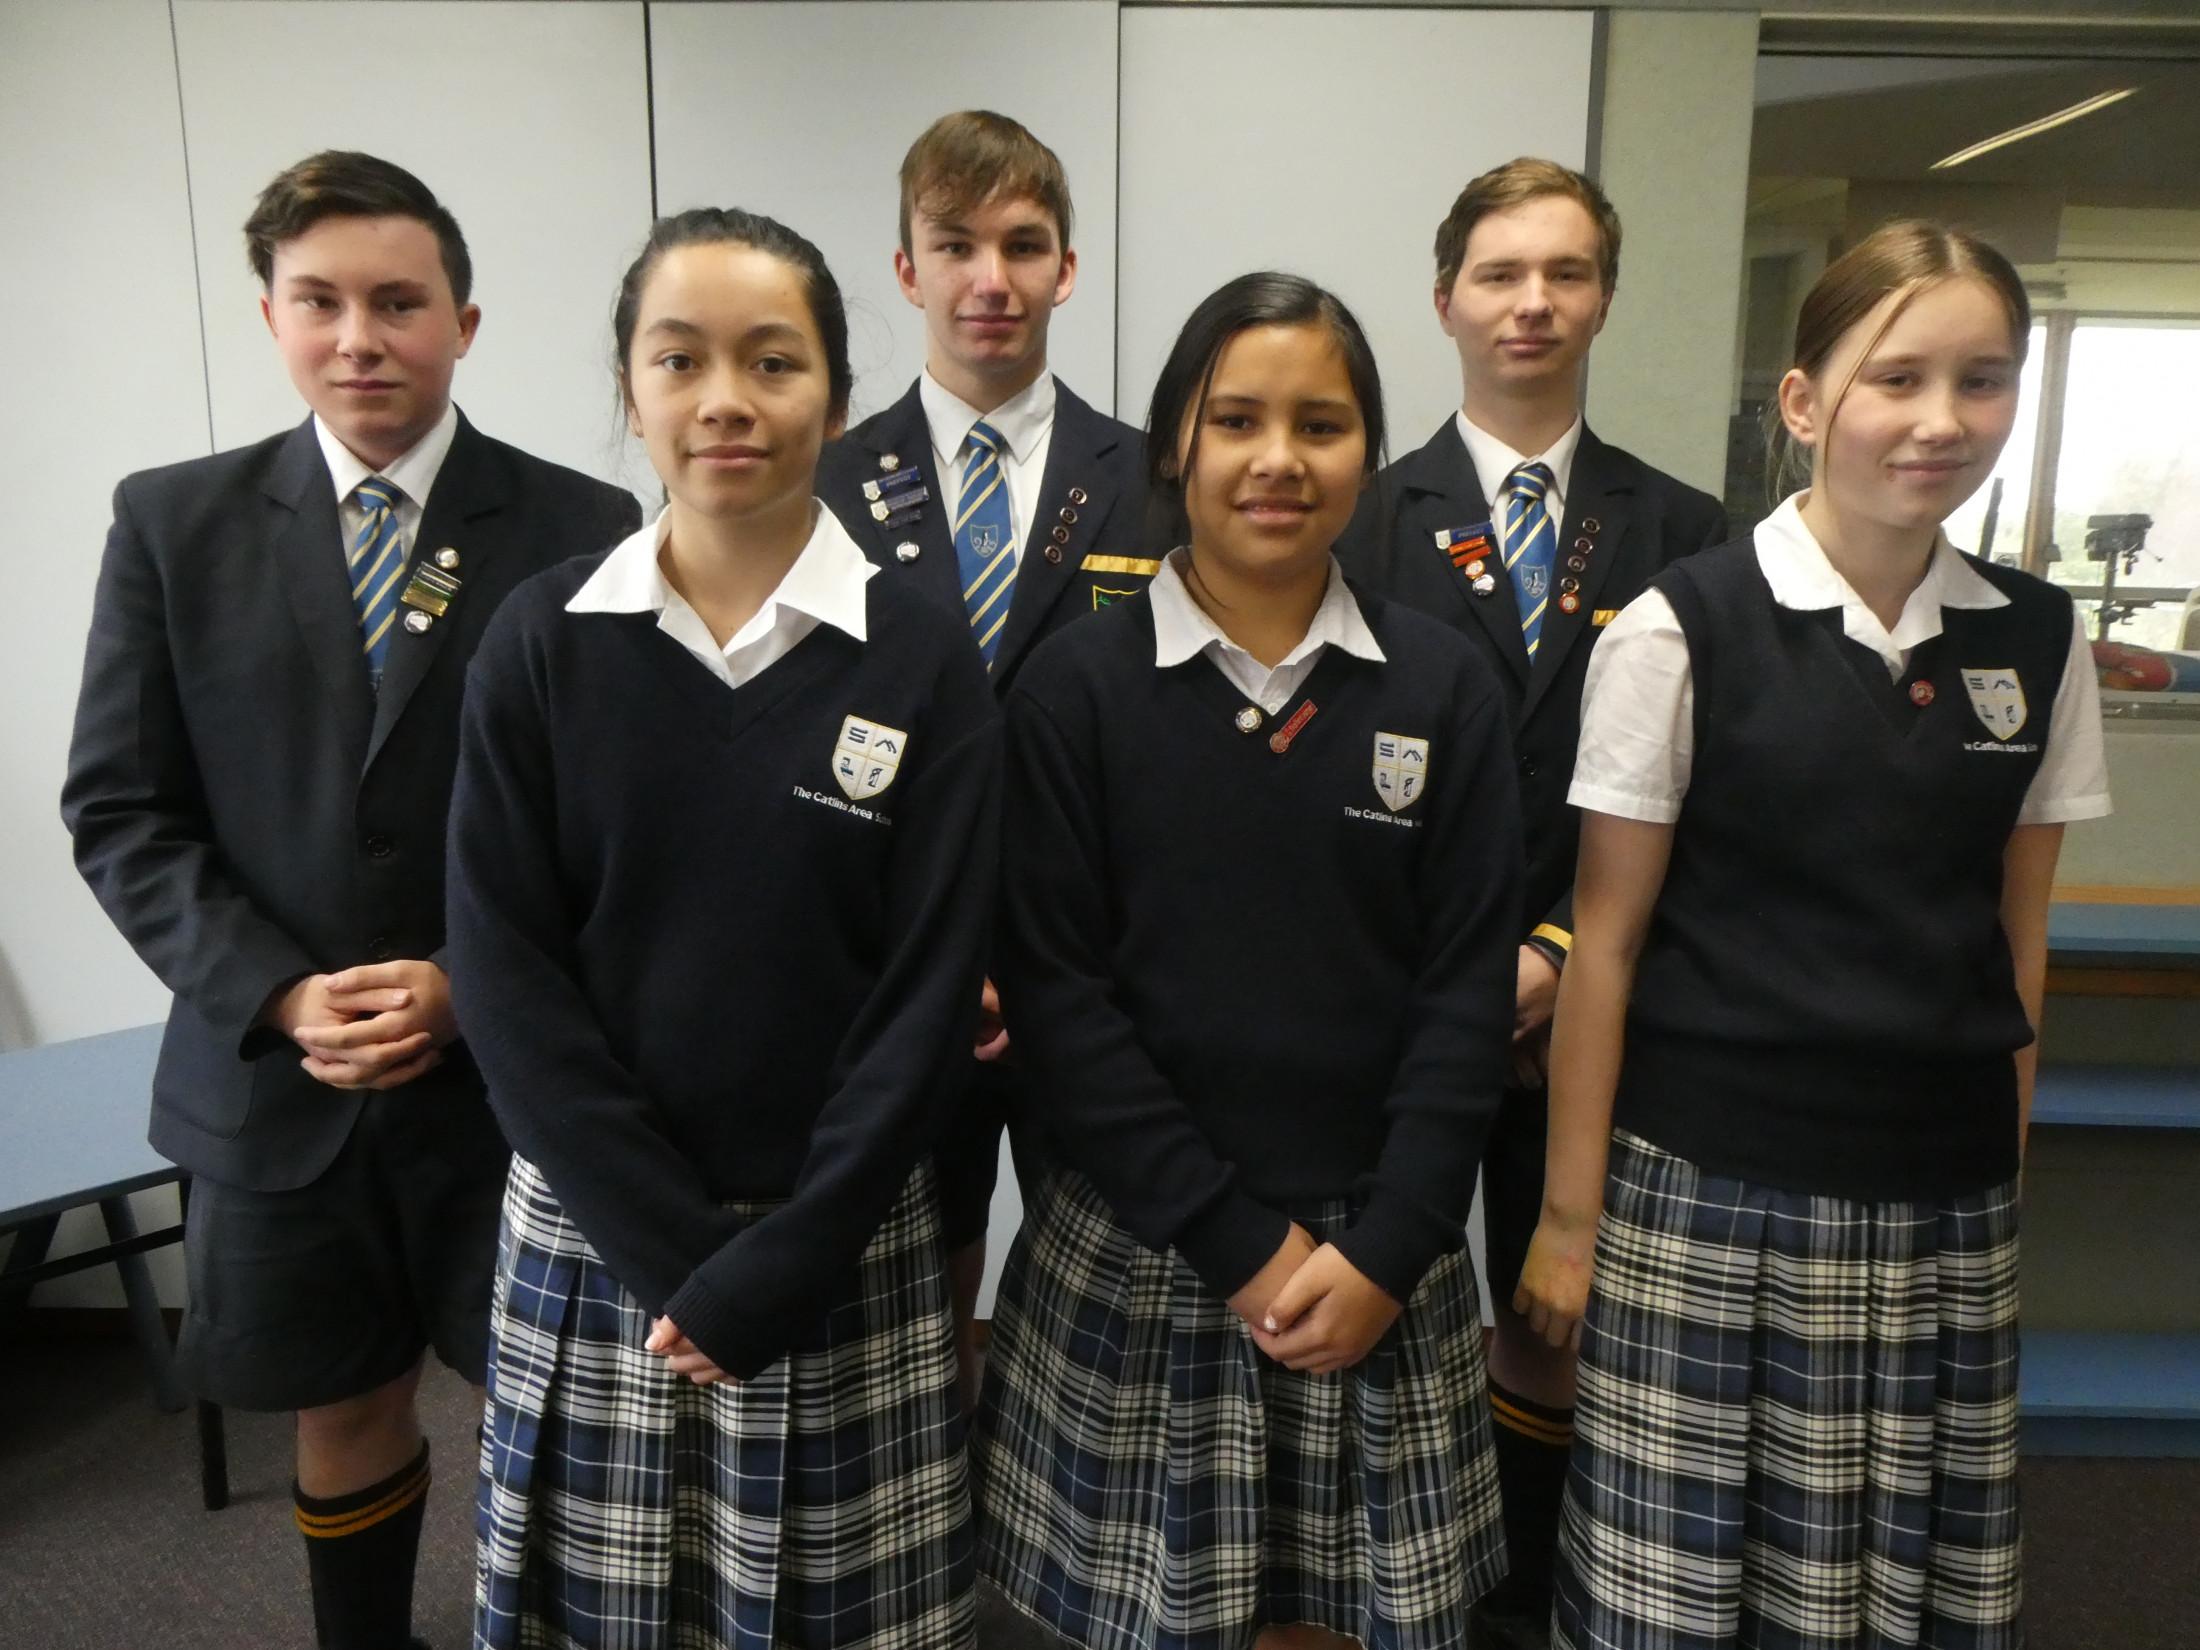 Uniform - Seniors (Yr9+)